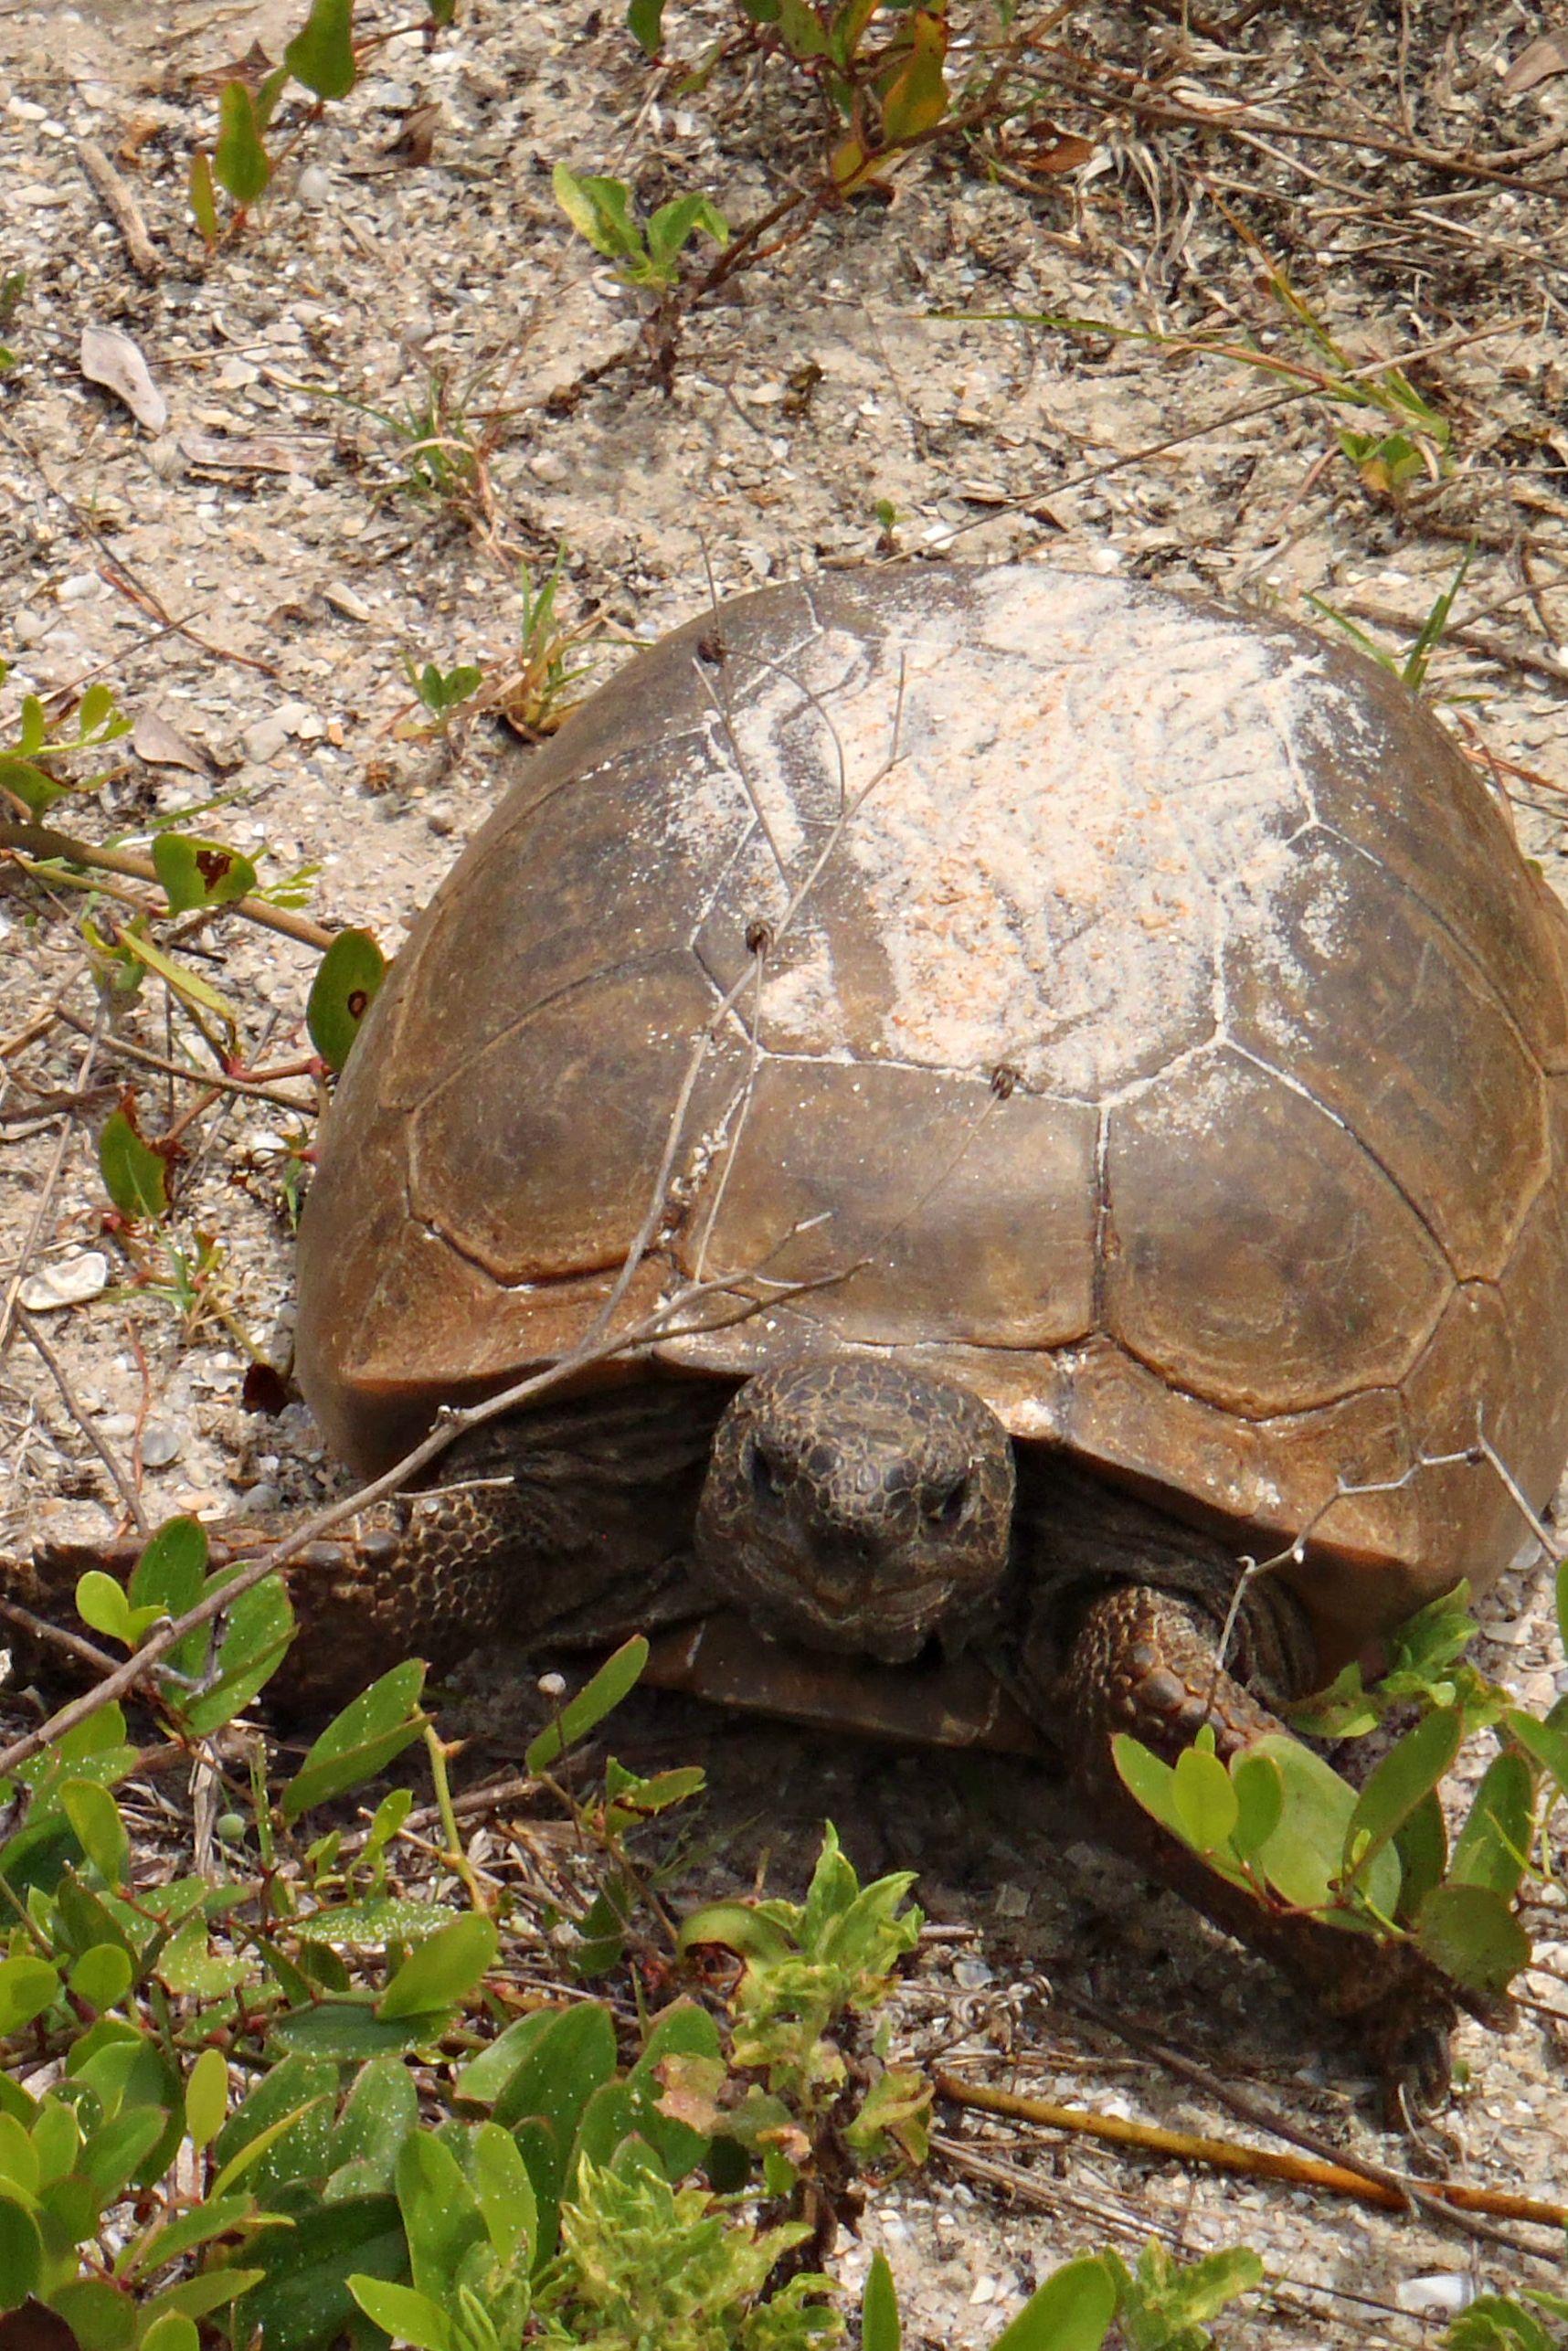 Gopher tortoise. New Smyrna Beach, FL Gopher Tortoises